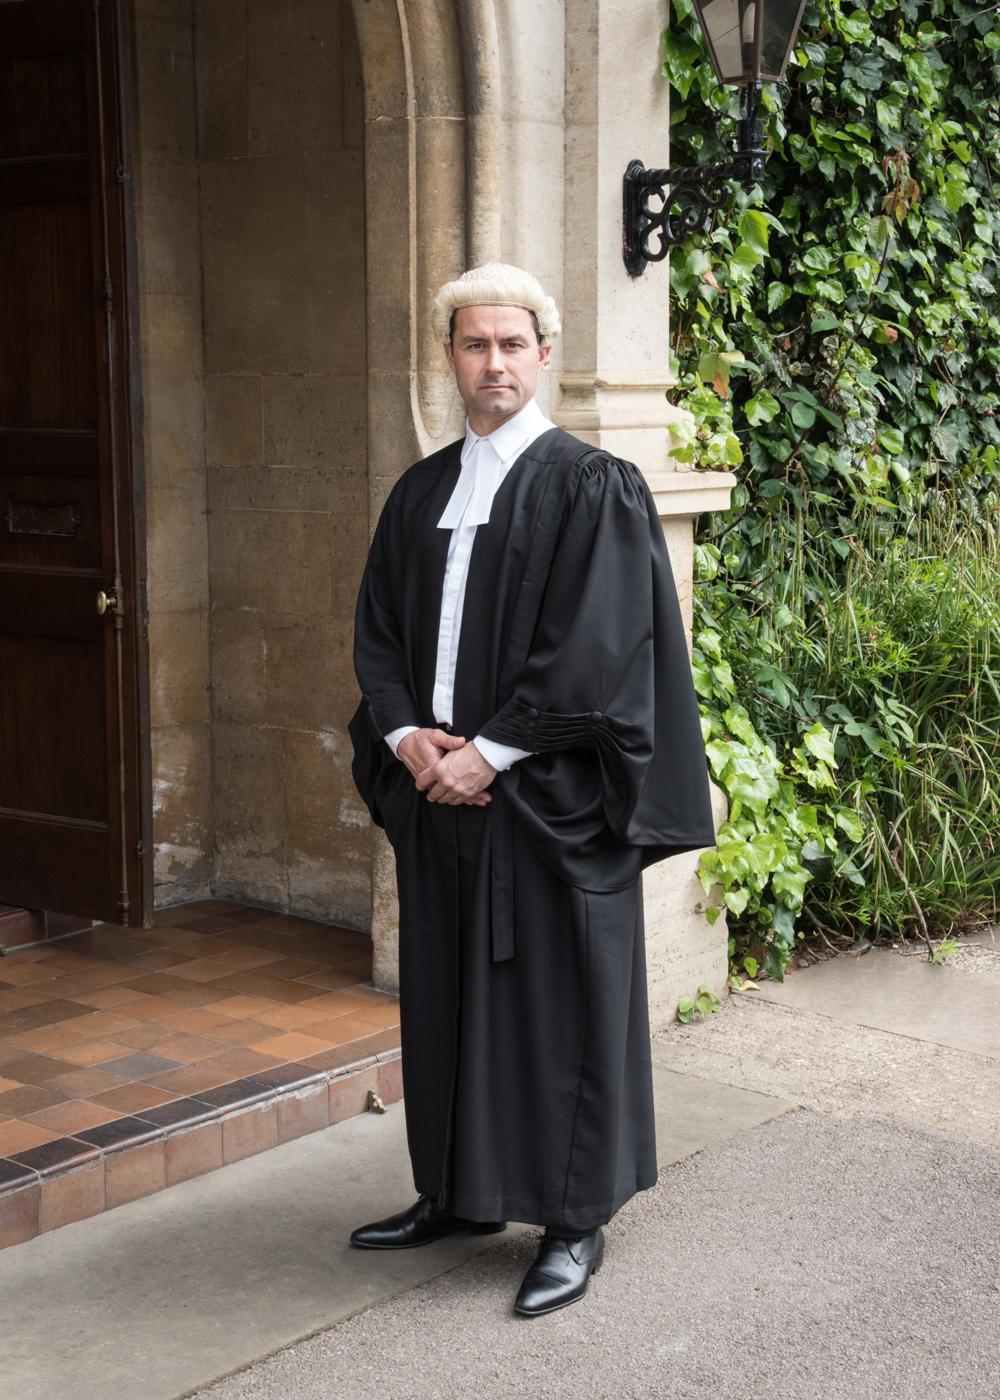 Legal Wigs & Gowns - Graduation Attire Legal Wear